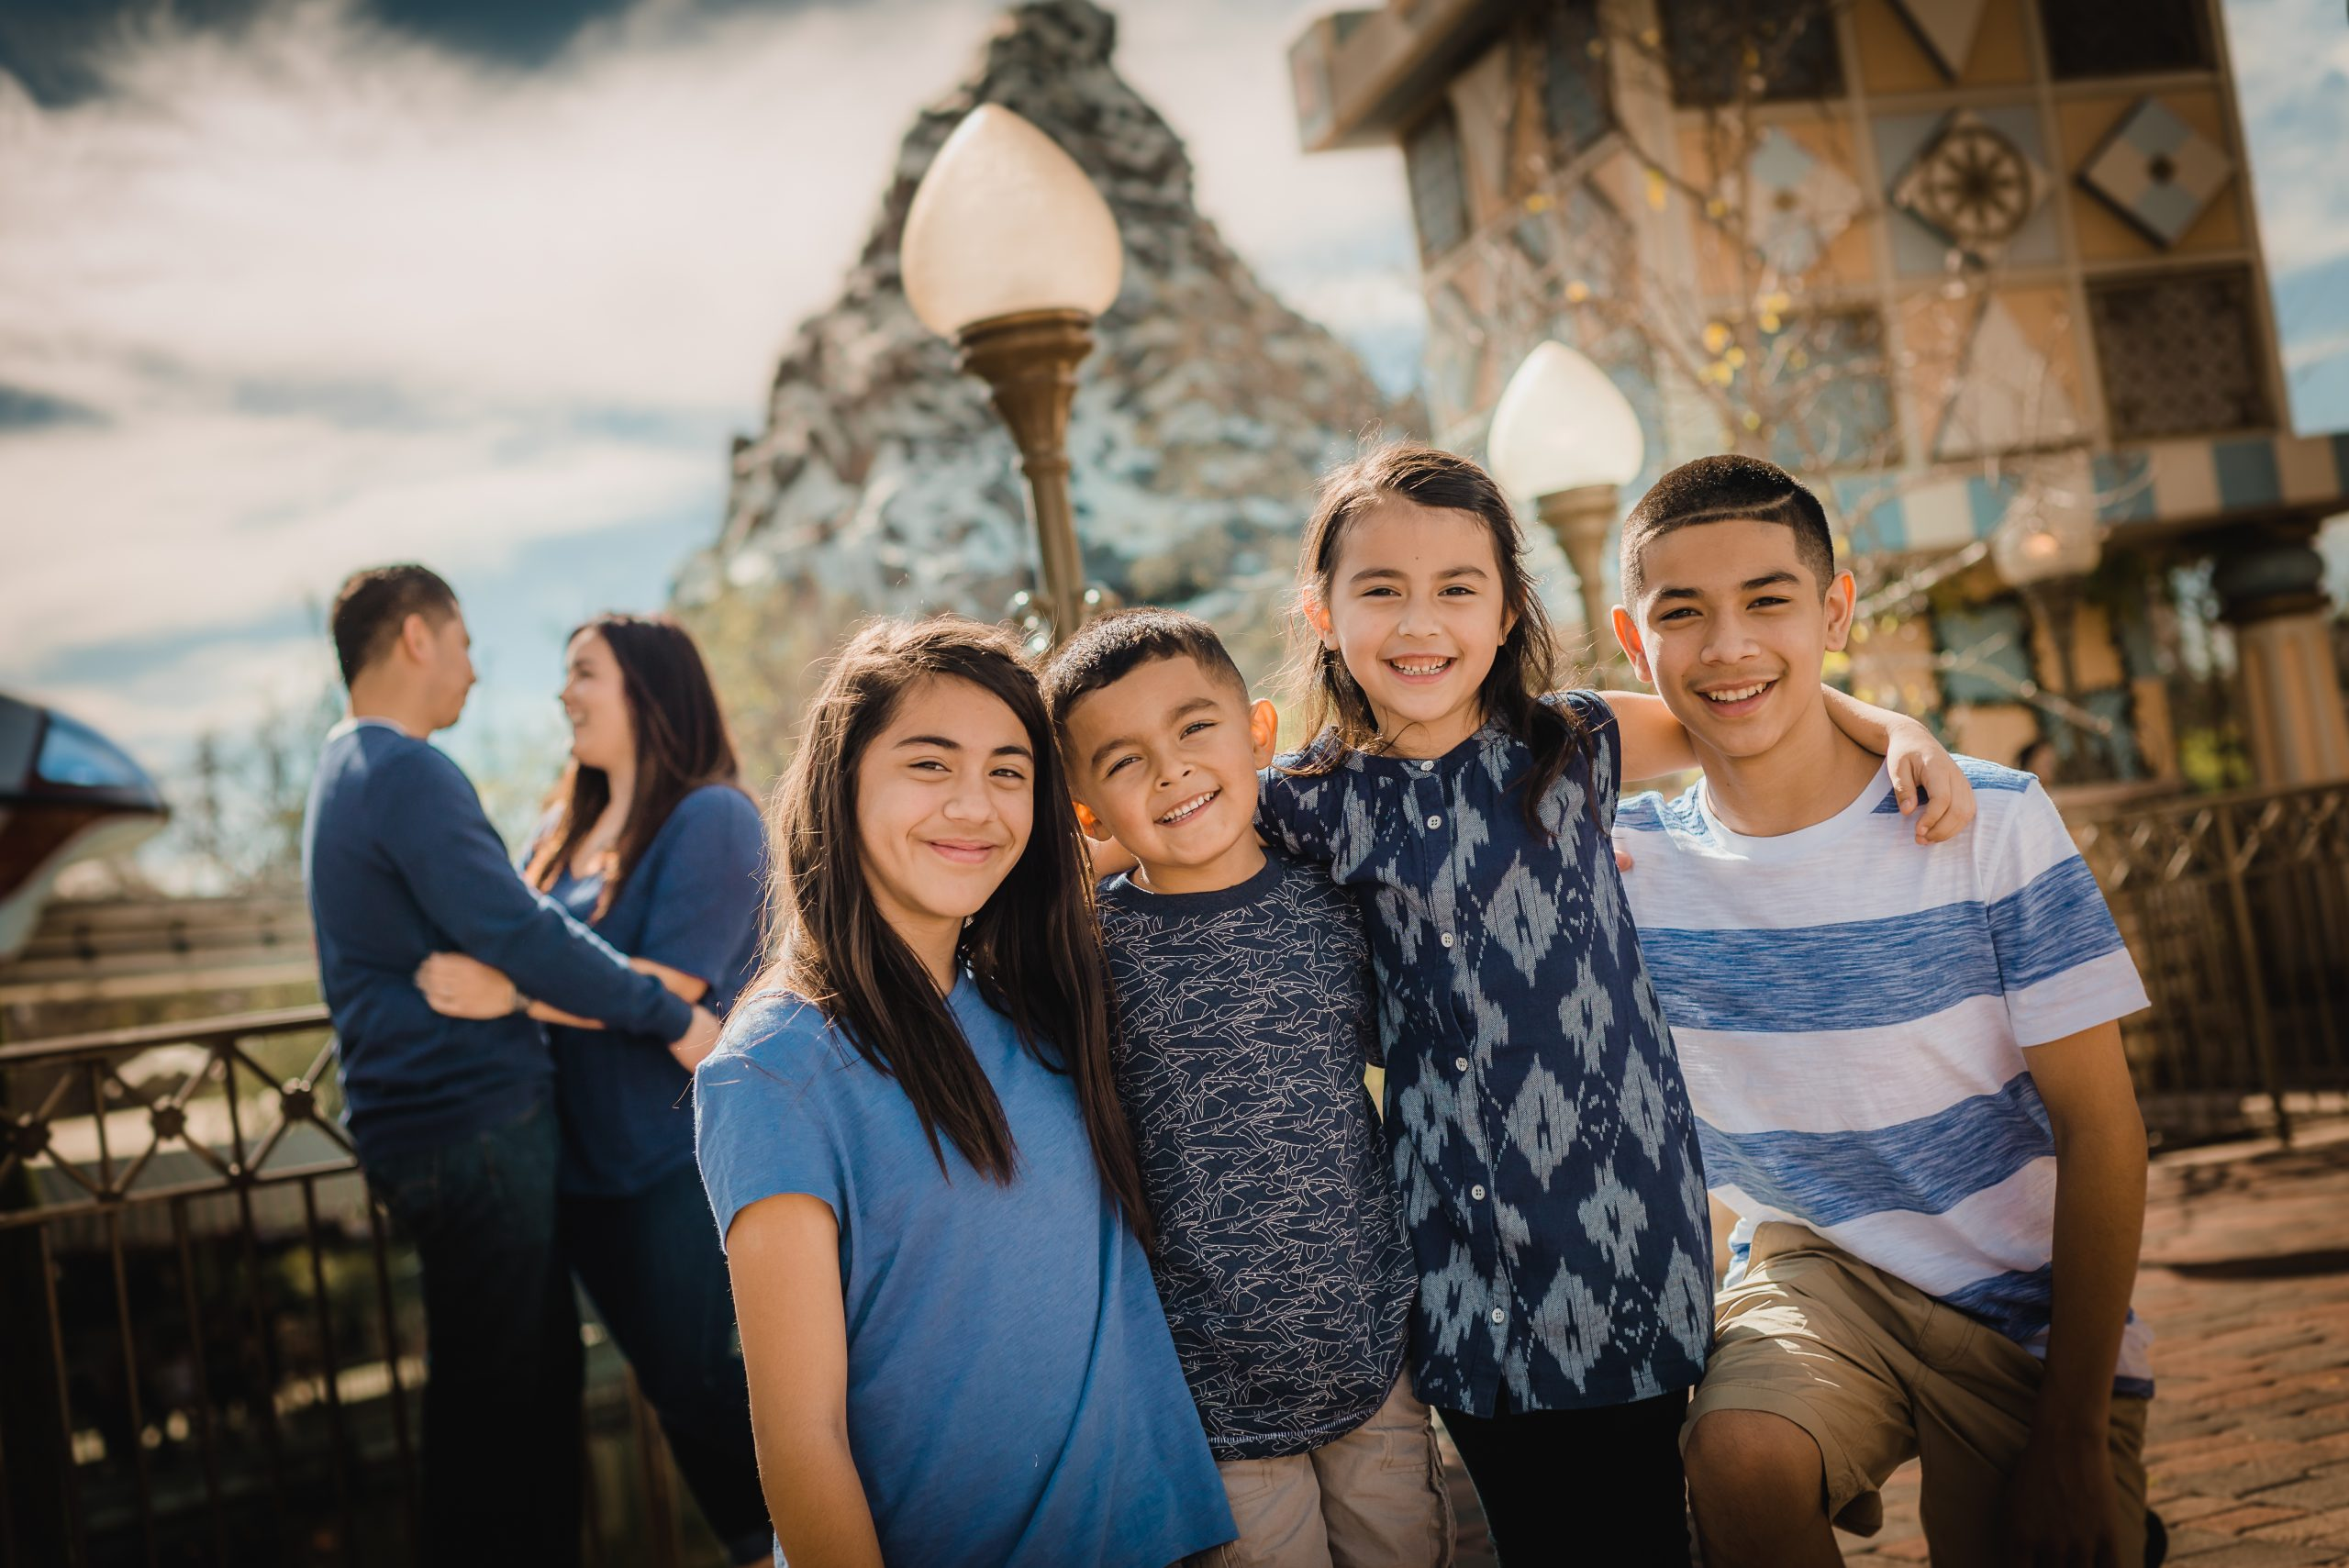 Family posing in front of the Matterhorn